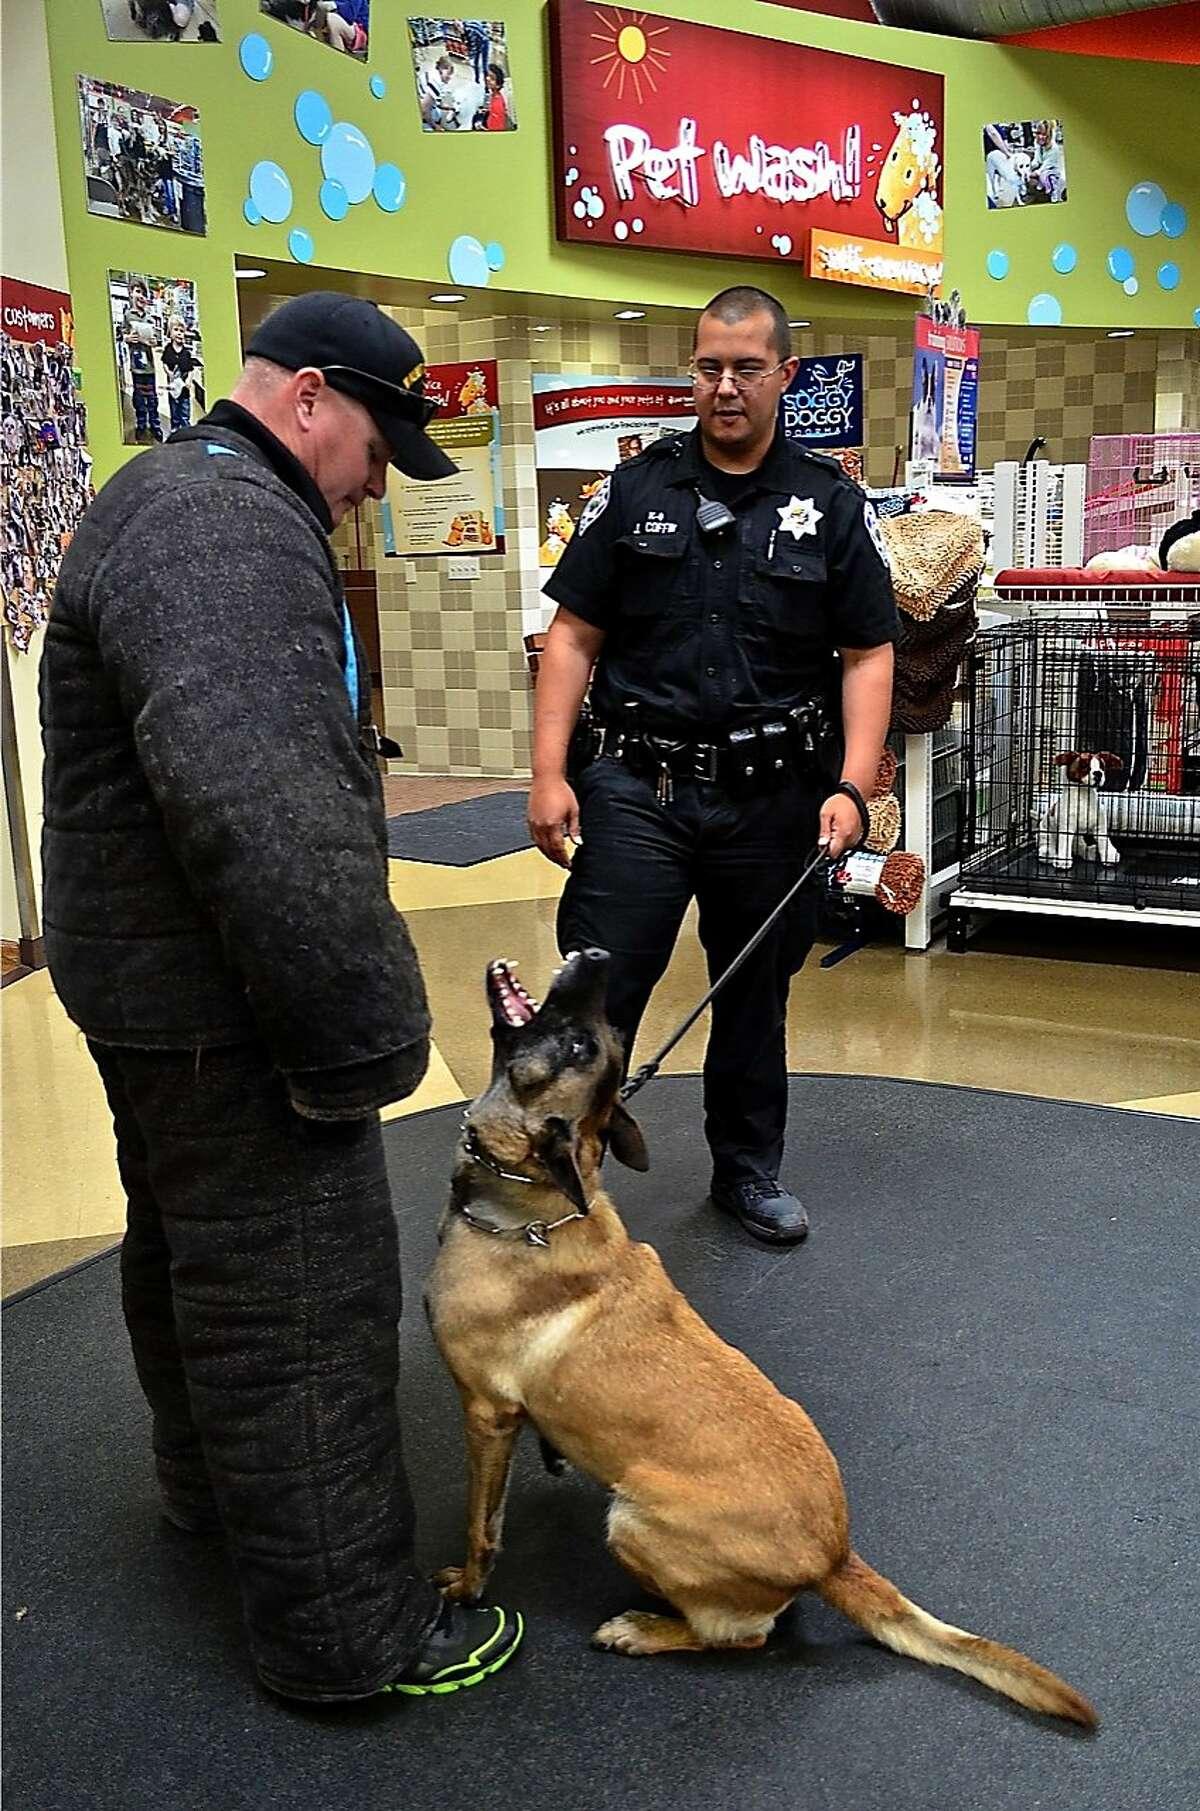 K9 Sheyna and handler Officer Joe Coffin. K9 Sheyna was injured Saturday night in police action in Walnut Creek.